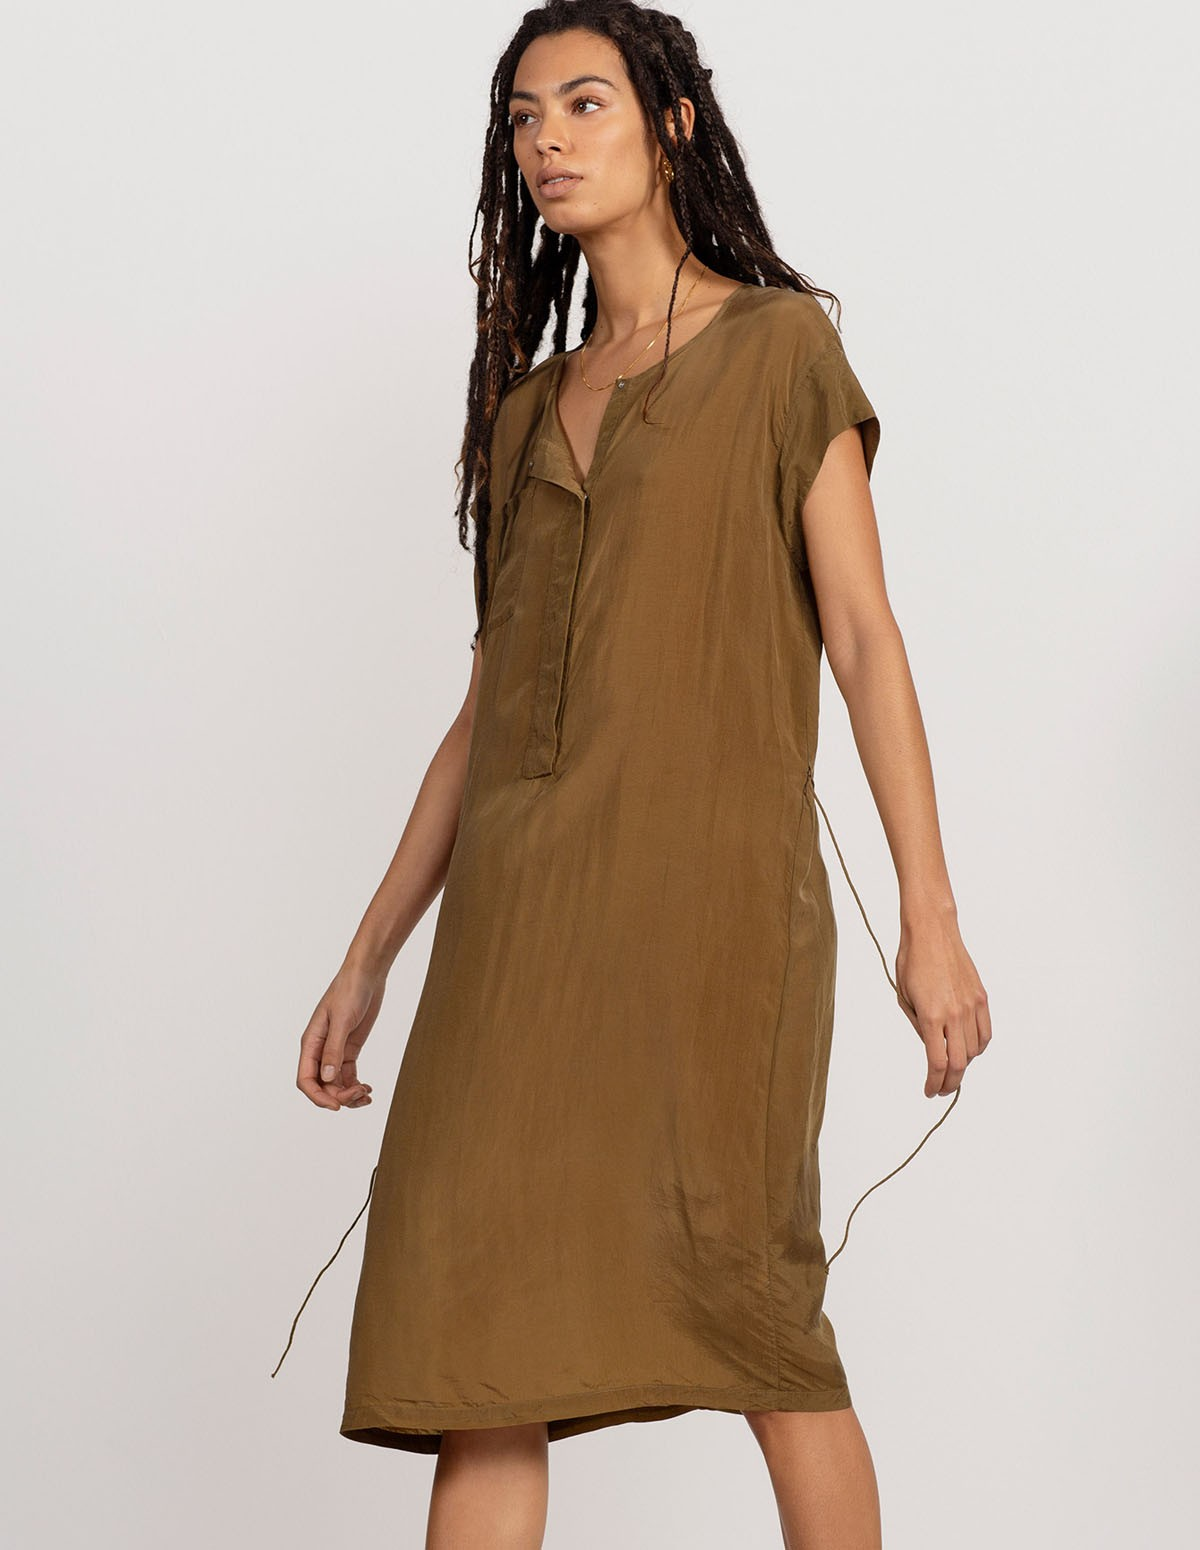 Huma French Dress - MILITARY